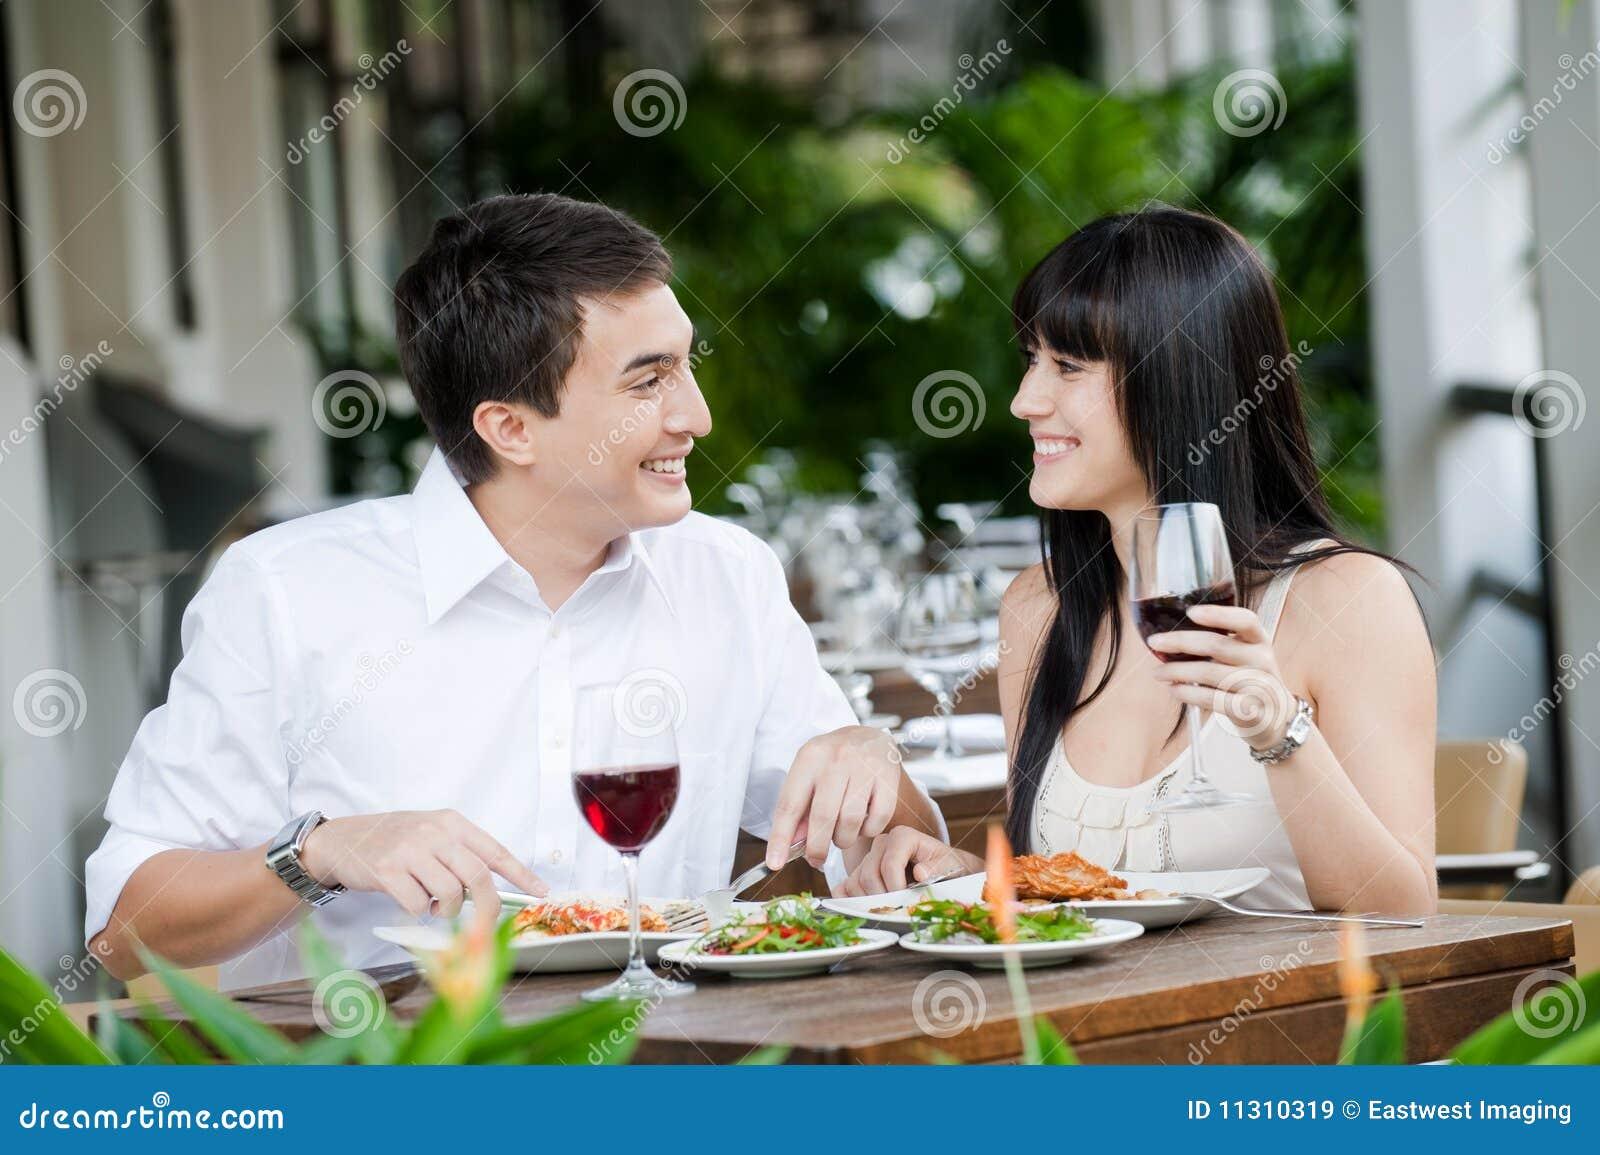 kbkbkb dating